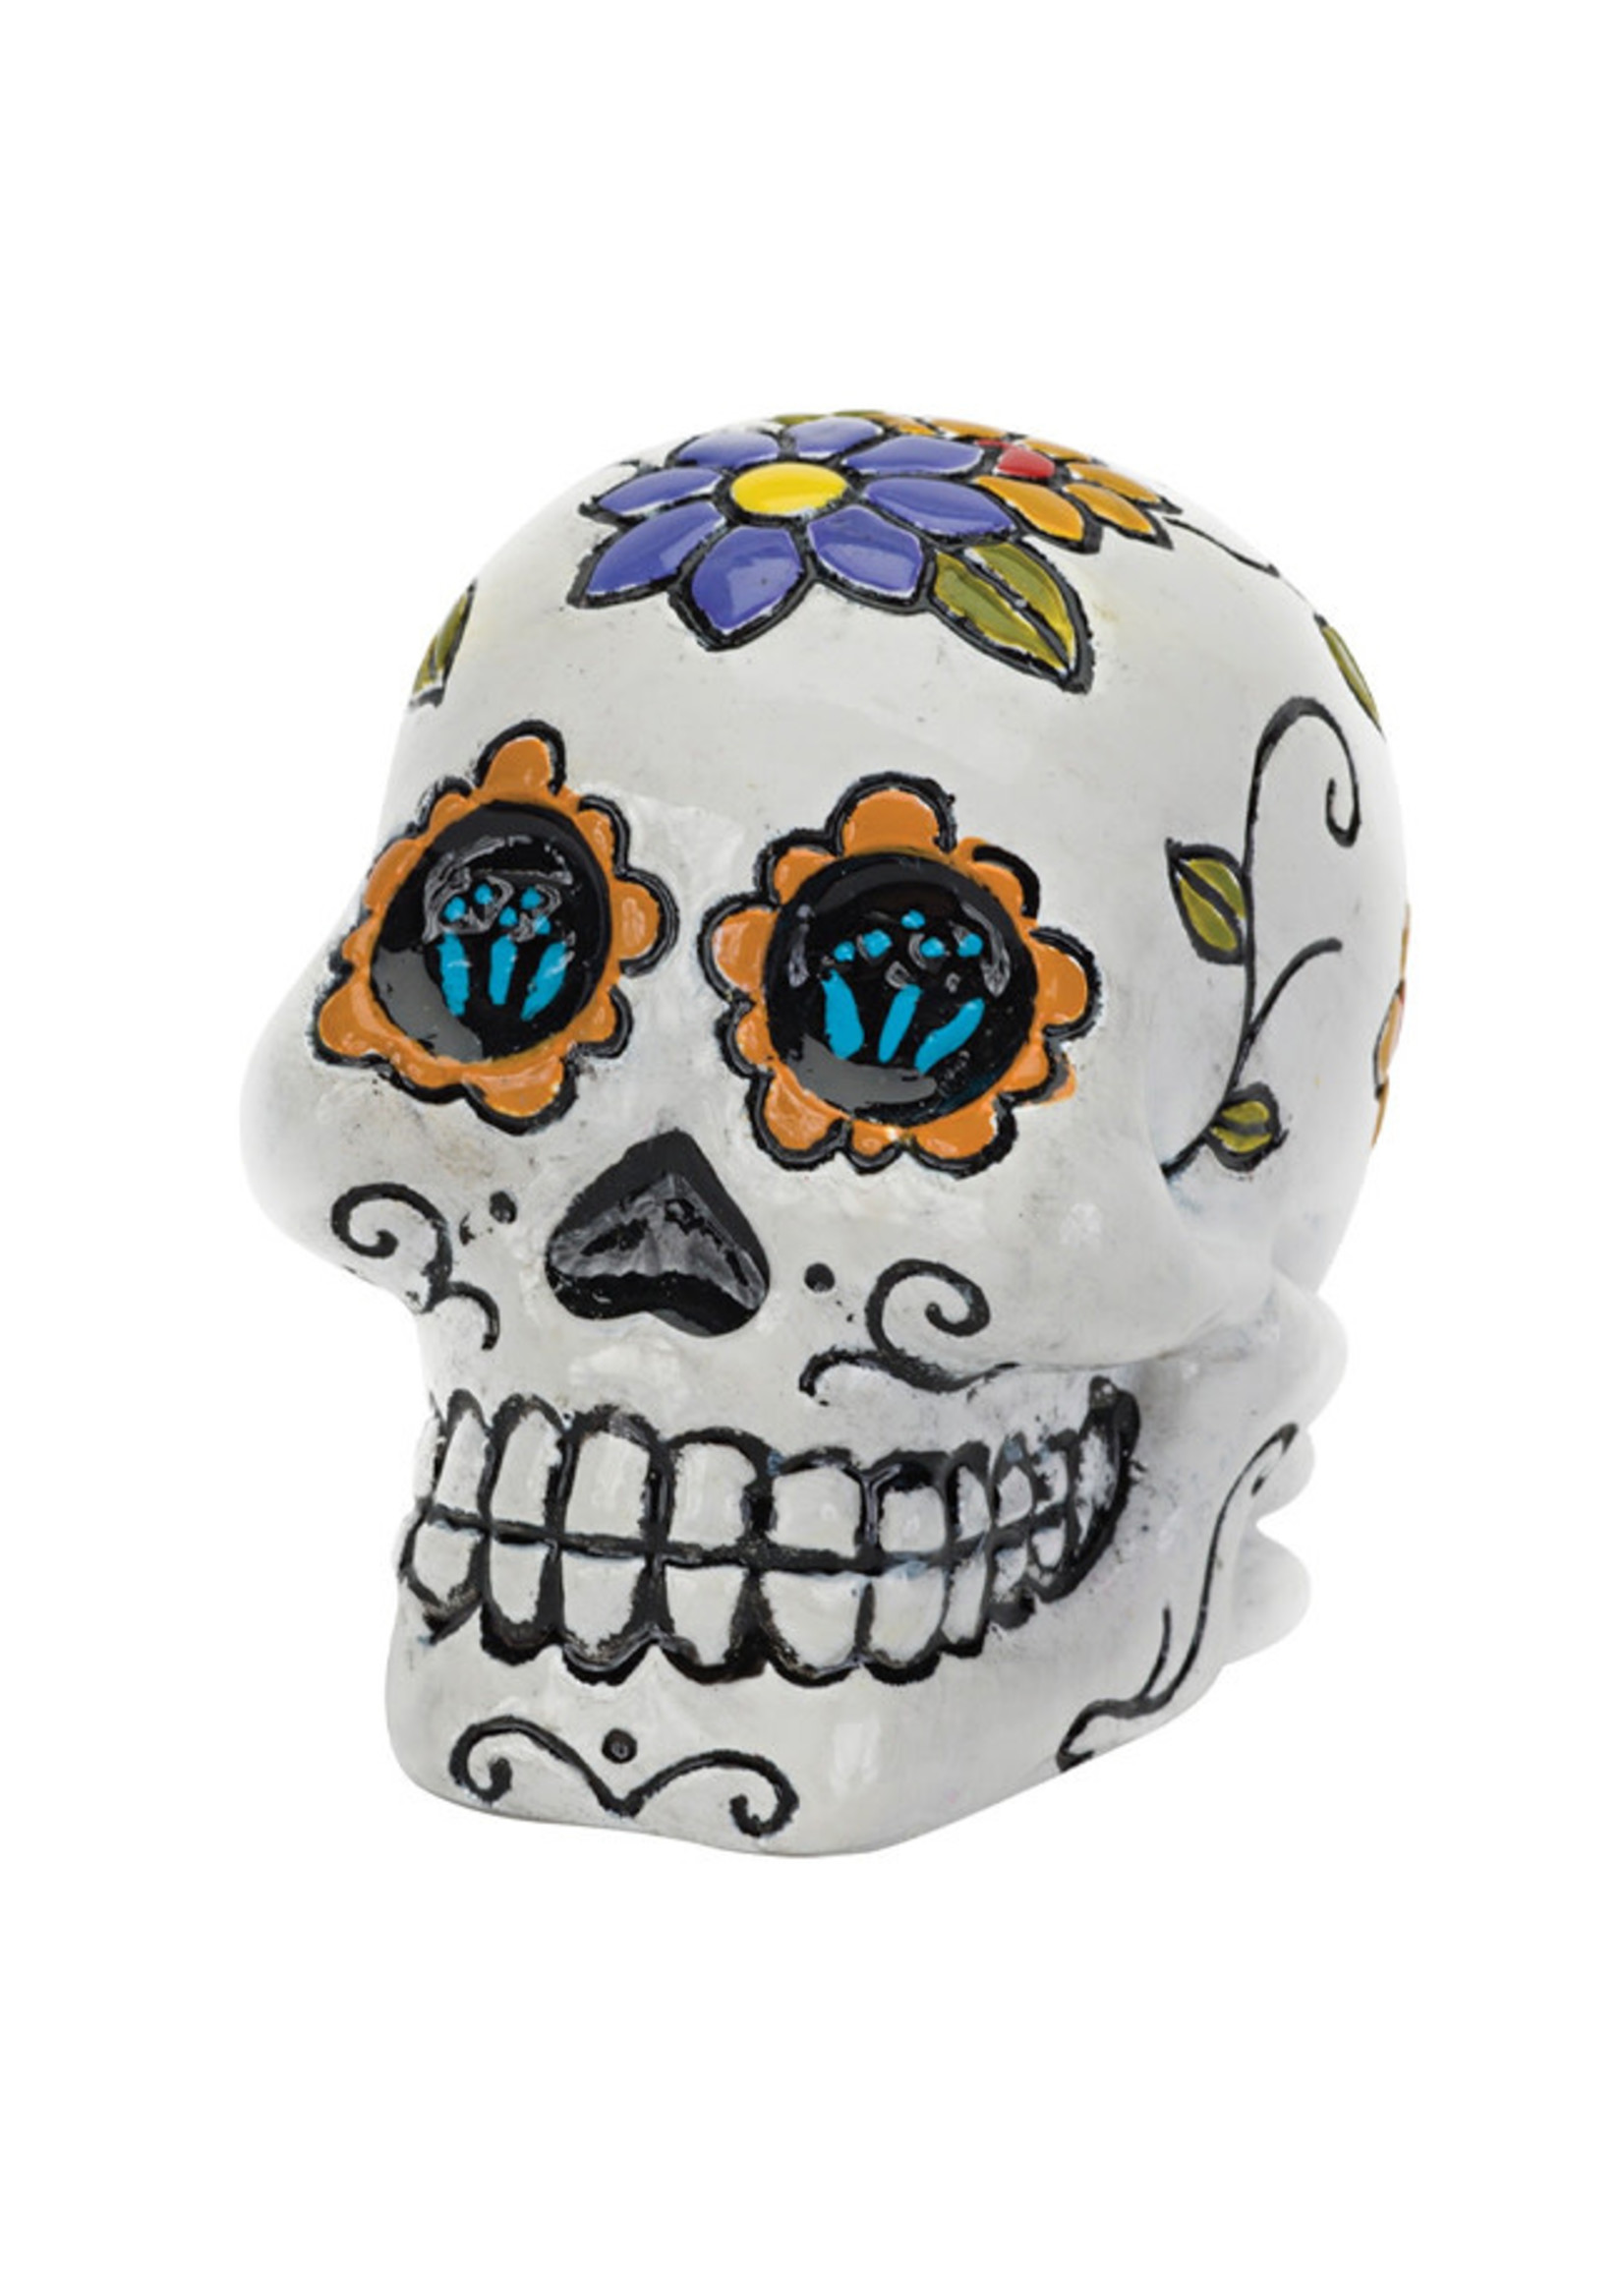 Penn-Plax Penn Plax Deco Replicas Mini Sugar Skull